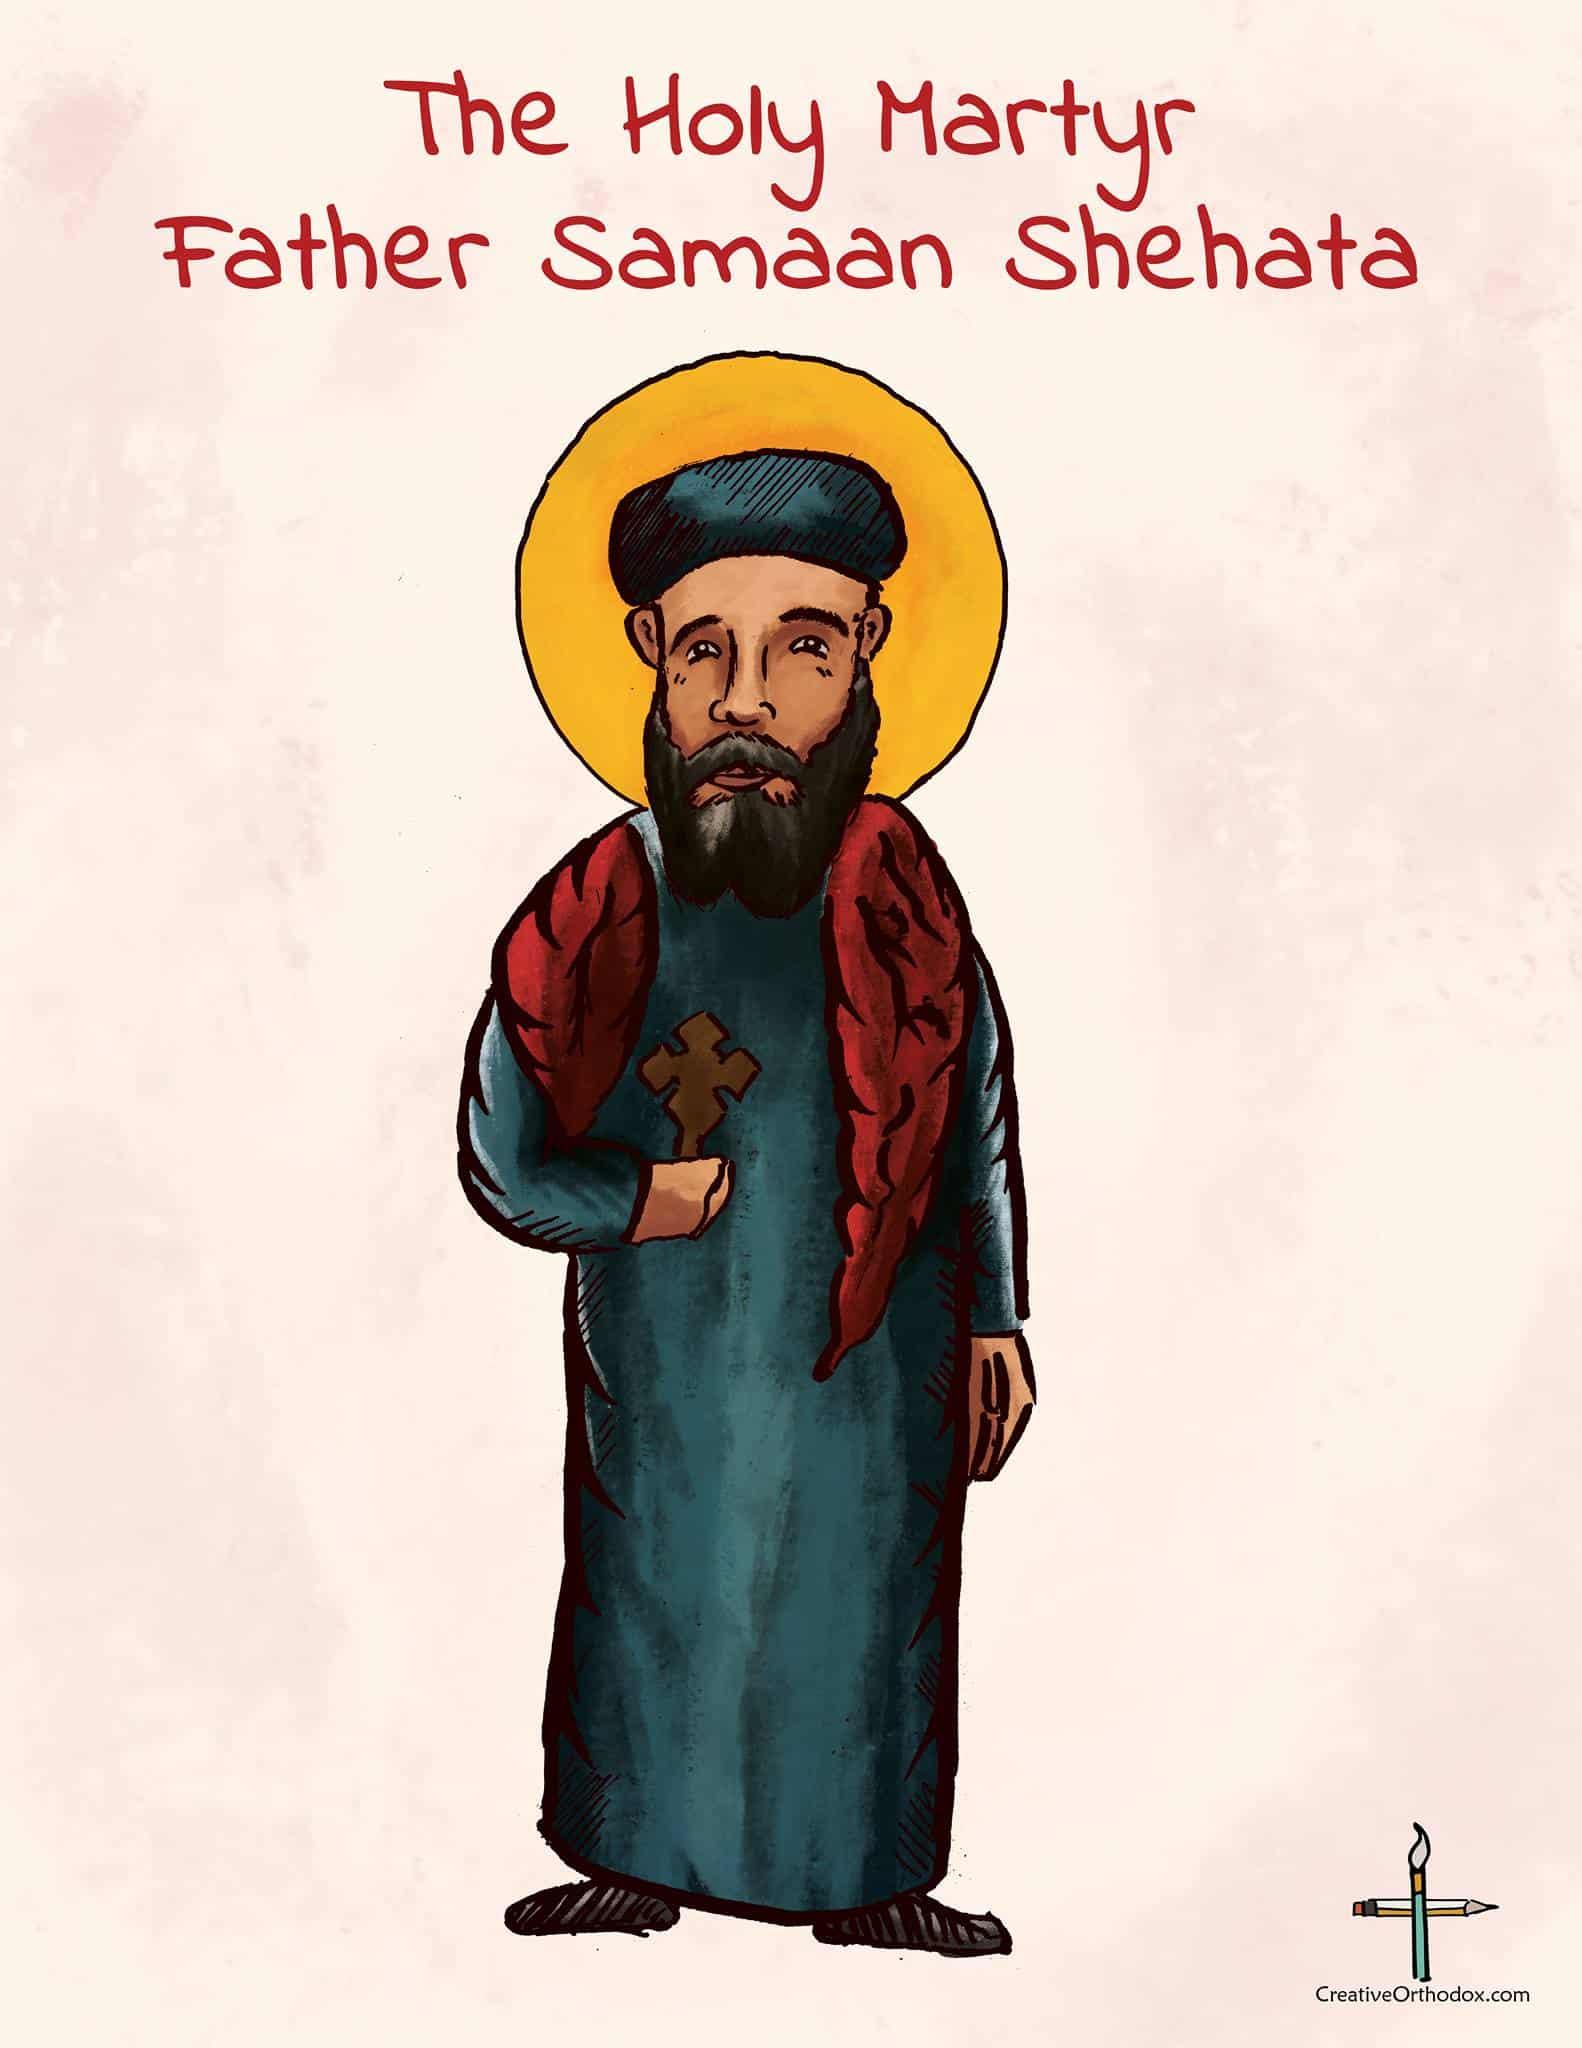 Father Samaan Shehata the Holy Martyr